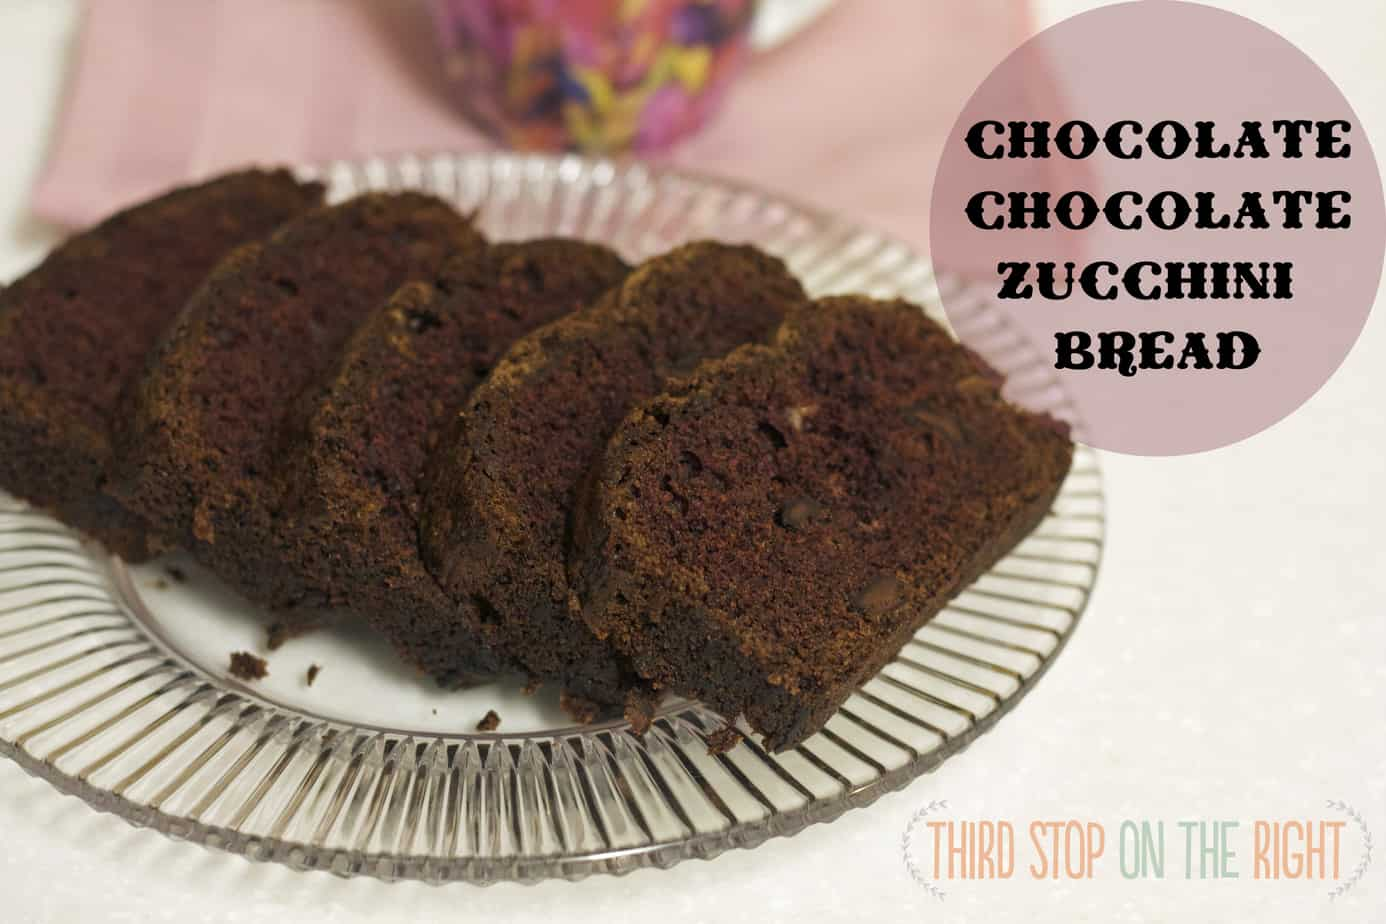 Either Breakfast or Dessert: Chocolate Chocolate Zucchini Bread Recipe